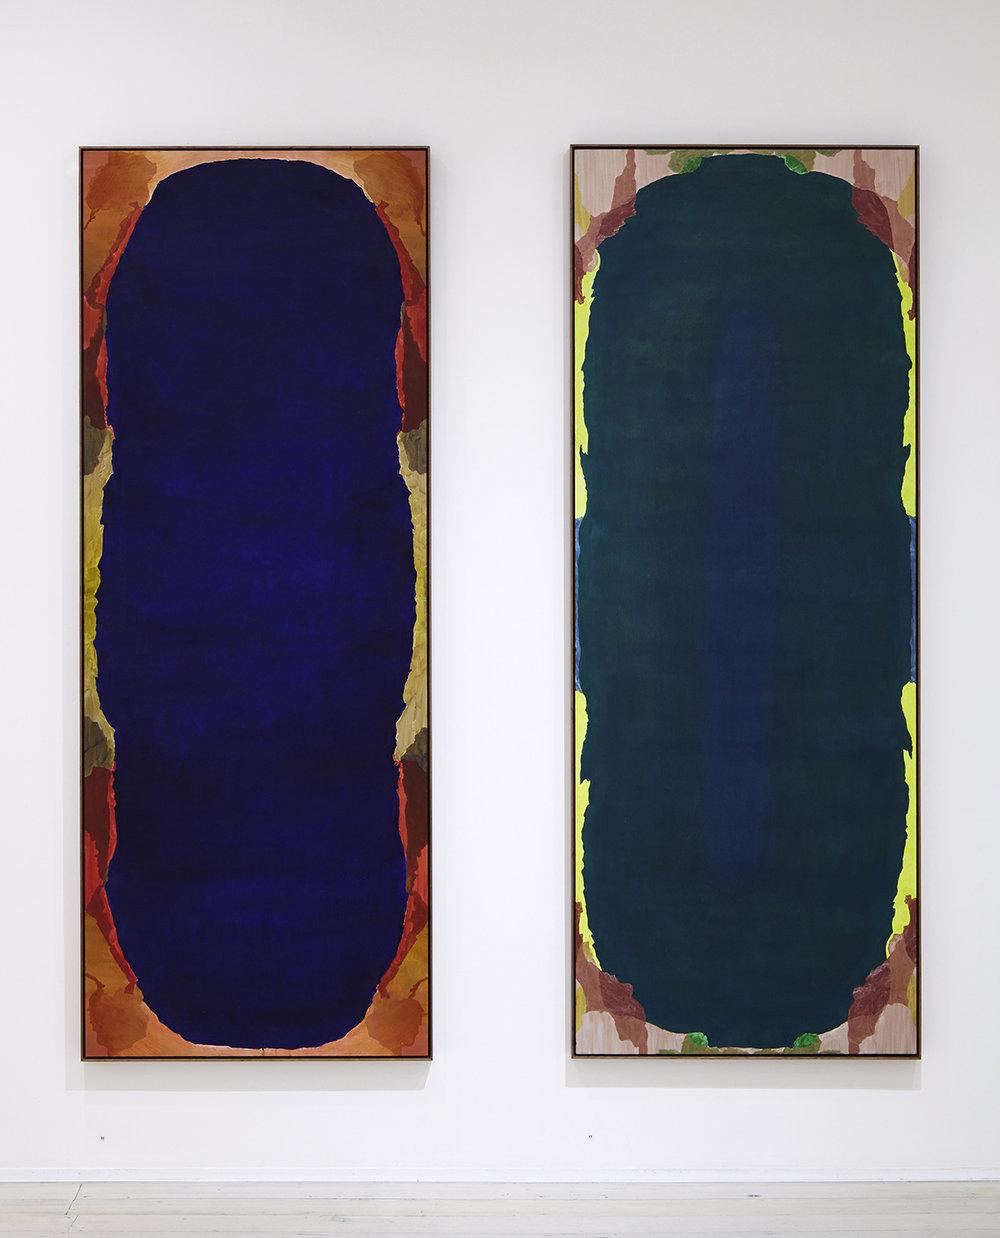 BELEM LETT Portal & Skylight 2015 oil, luminescent pigment on aluminium composite panel 200 ×77 cm each